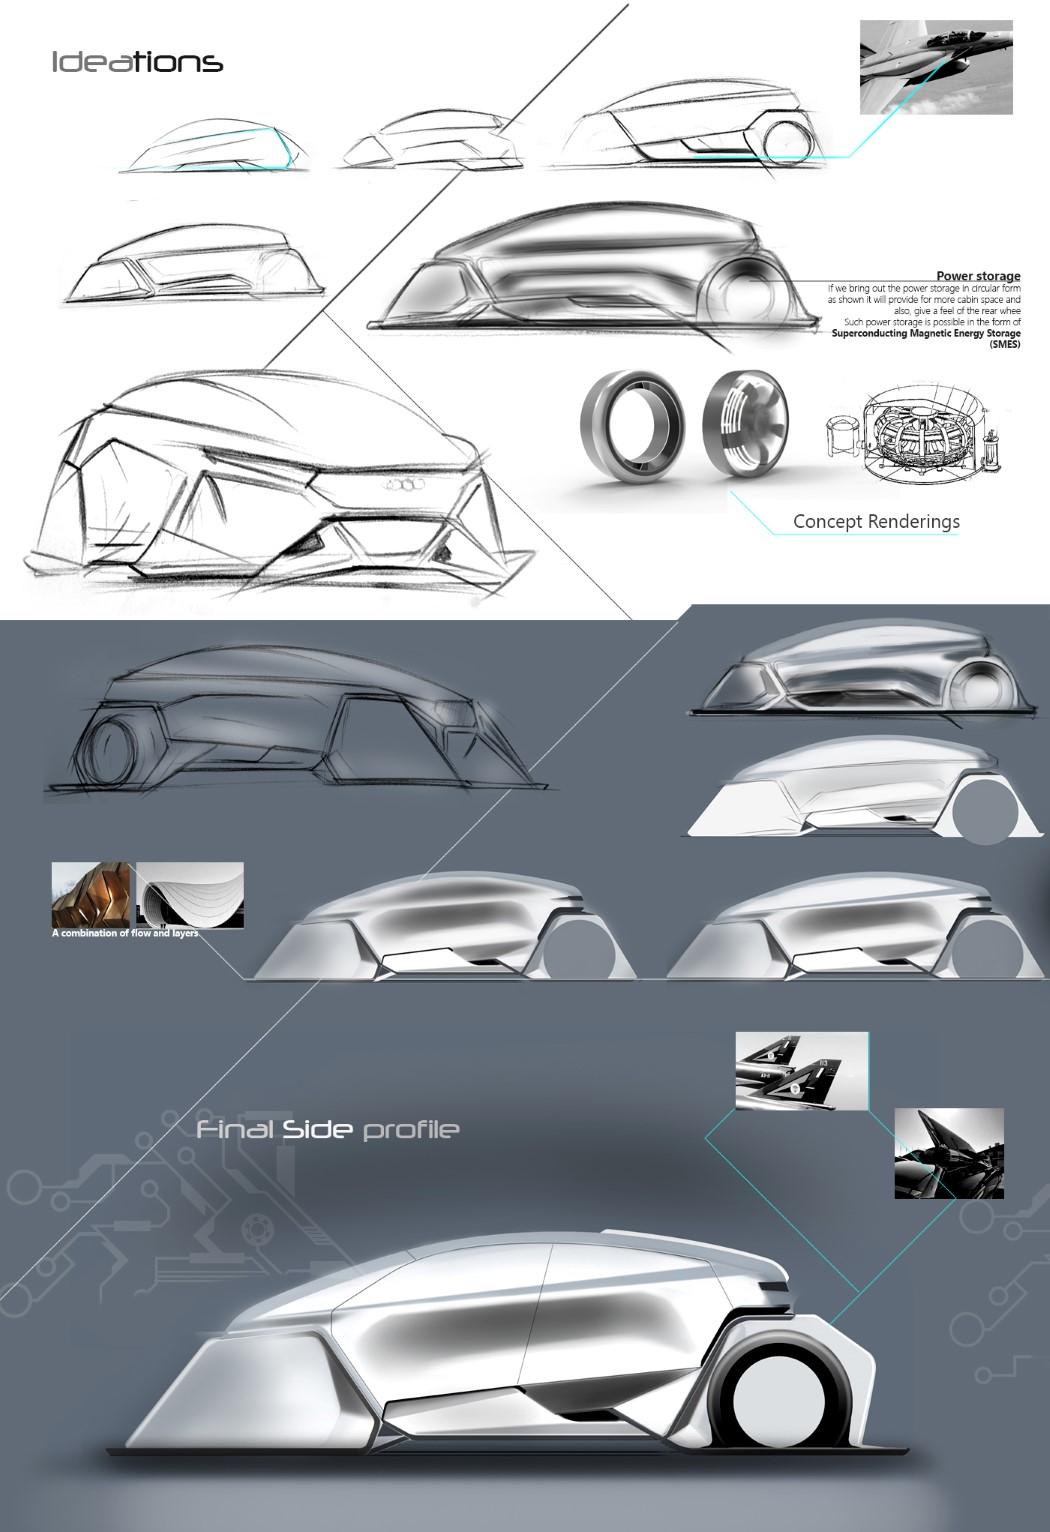 hyperloop_hmobility_5